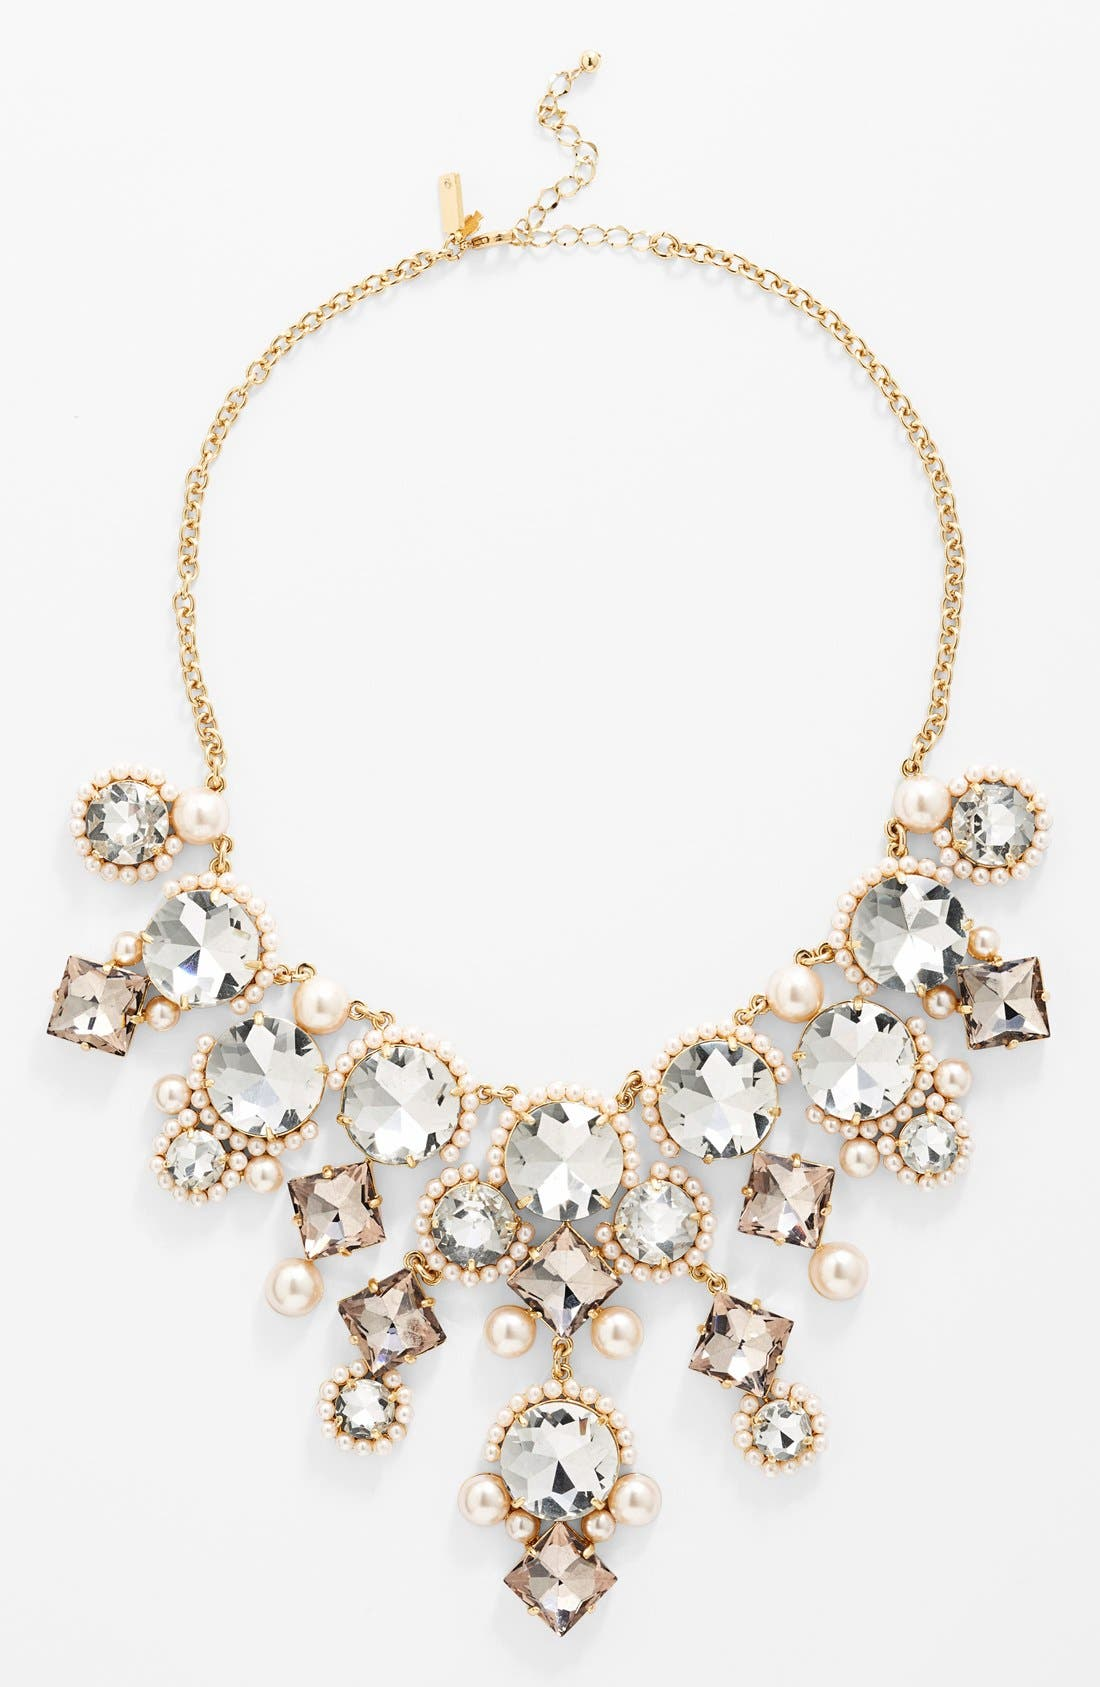 Alternate Image 1 Selected - kate spade new york 'palace gems' bib necklace